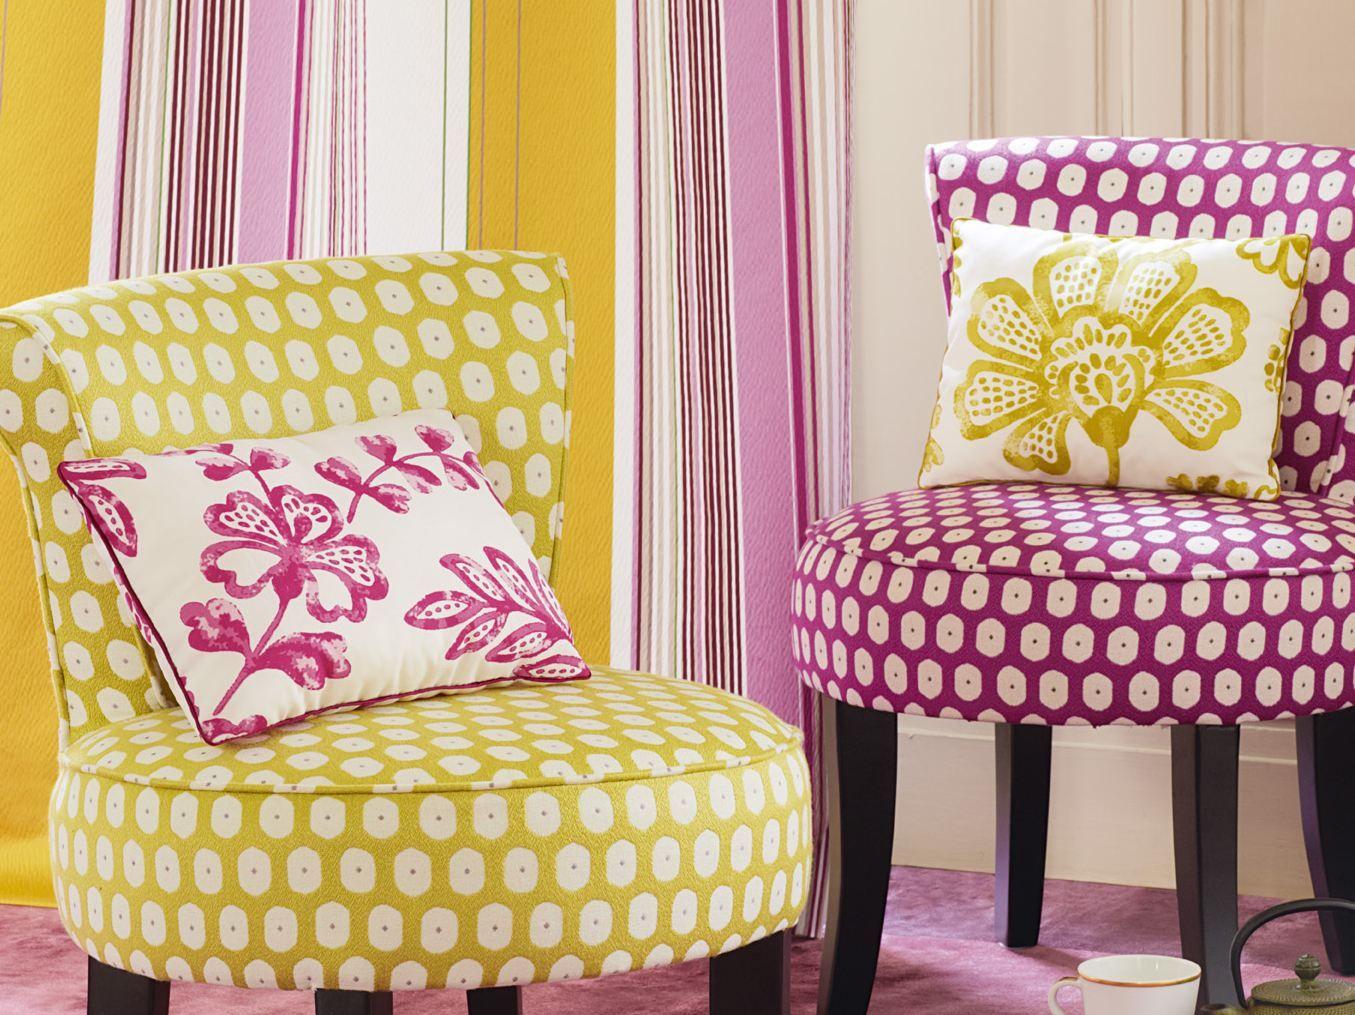 mousti tissu d 39 ameublement by zimmer rohde. Black Bedroom Furniture Sets. Home Design Ideas